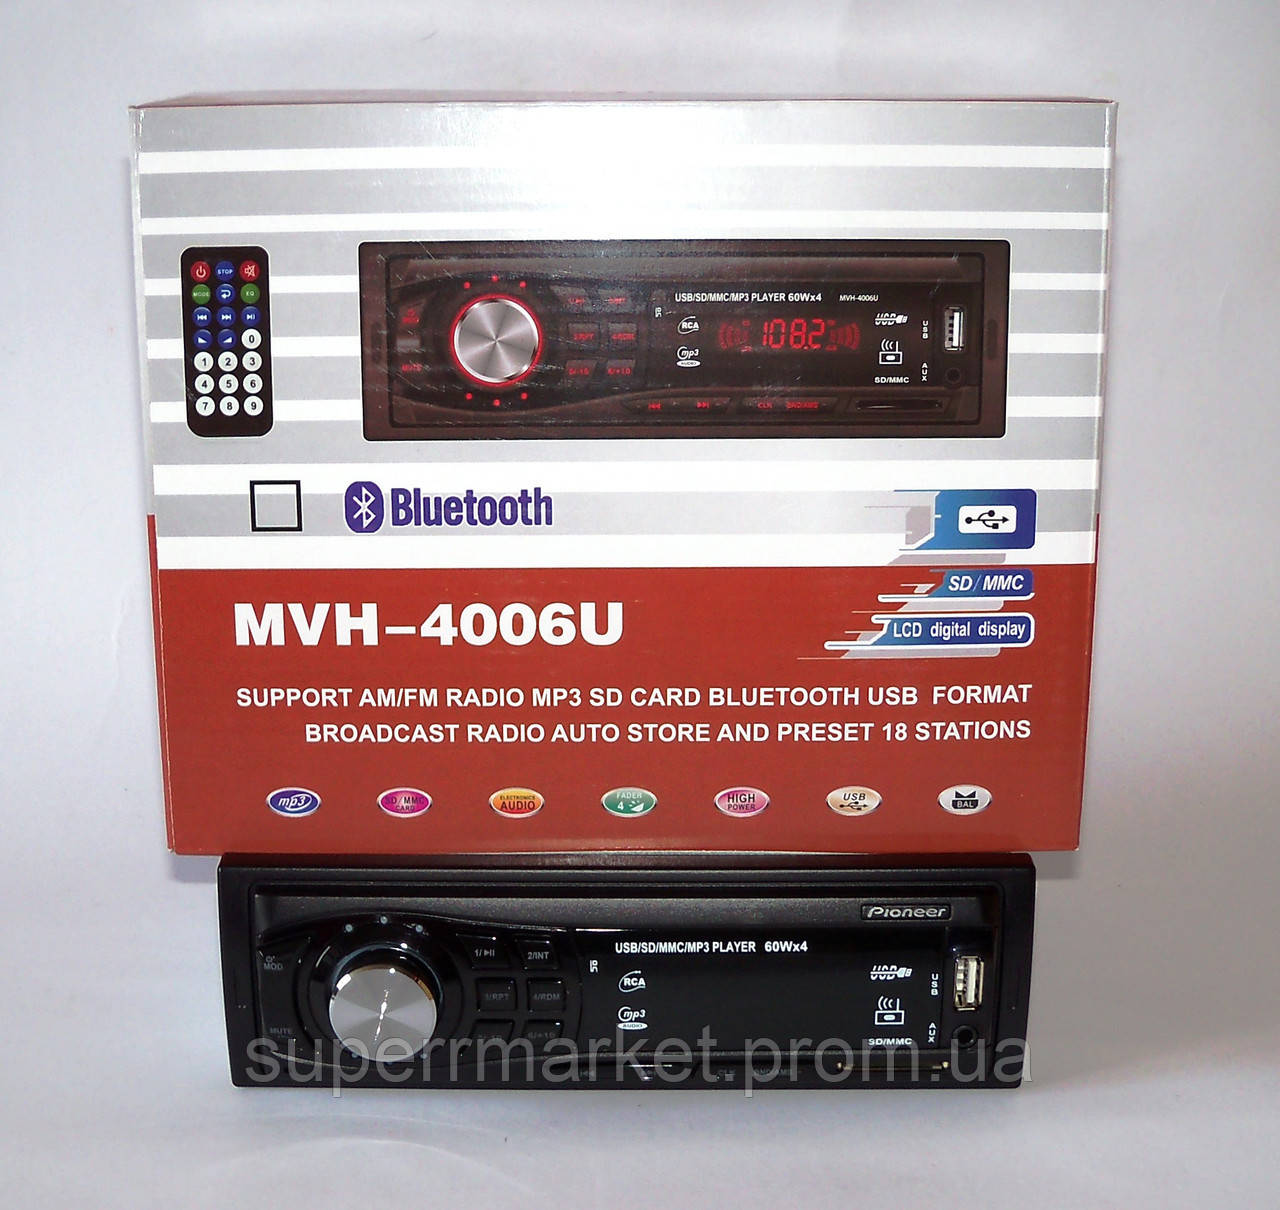 Автомагнитола Pioneer MVH-4006U 60W MP3 SD USB AUX FM